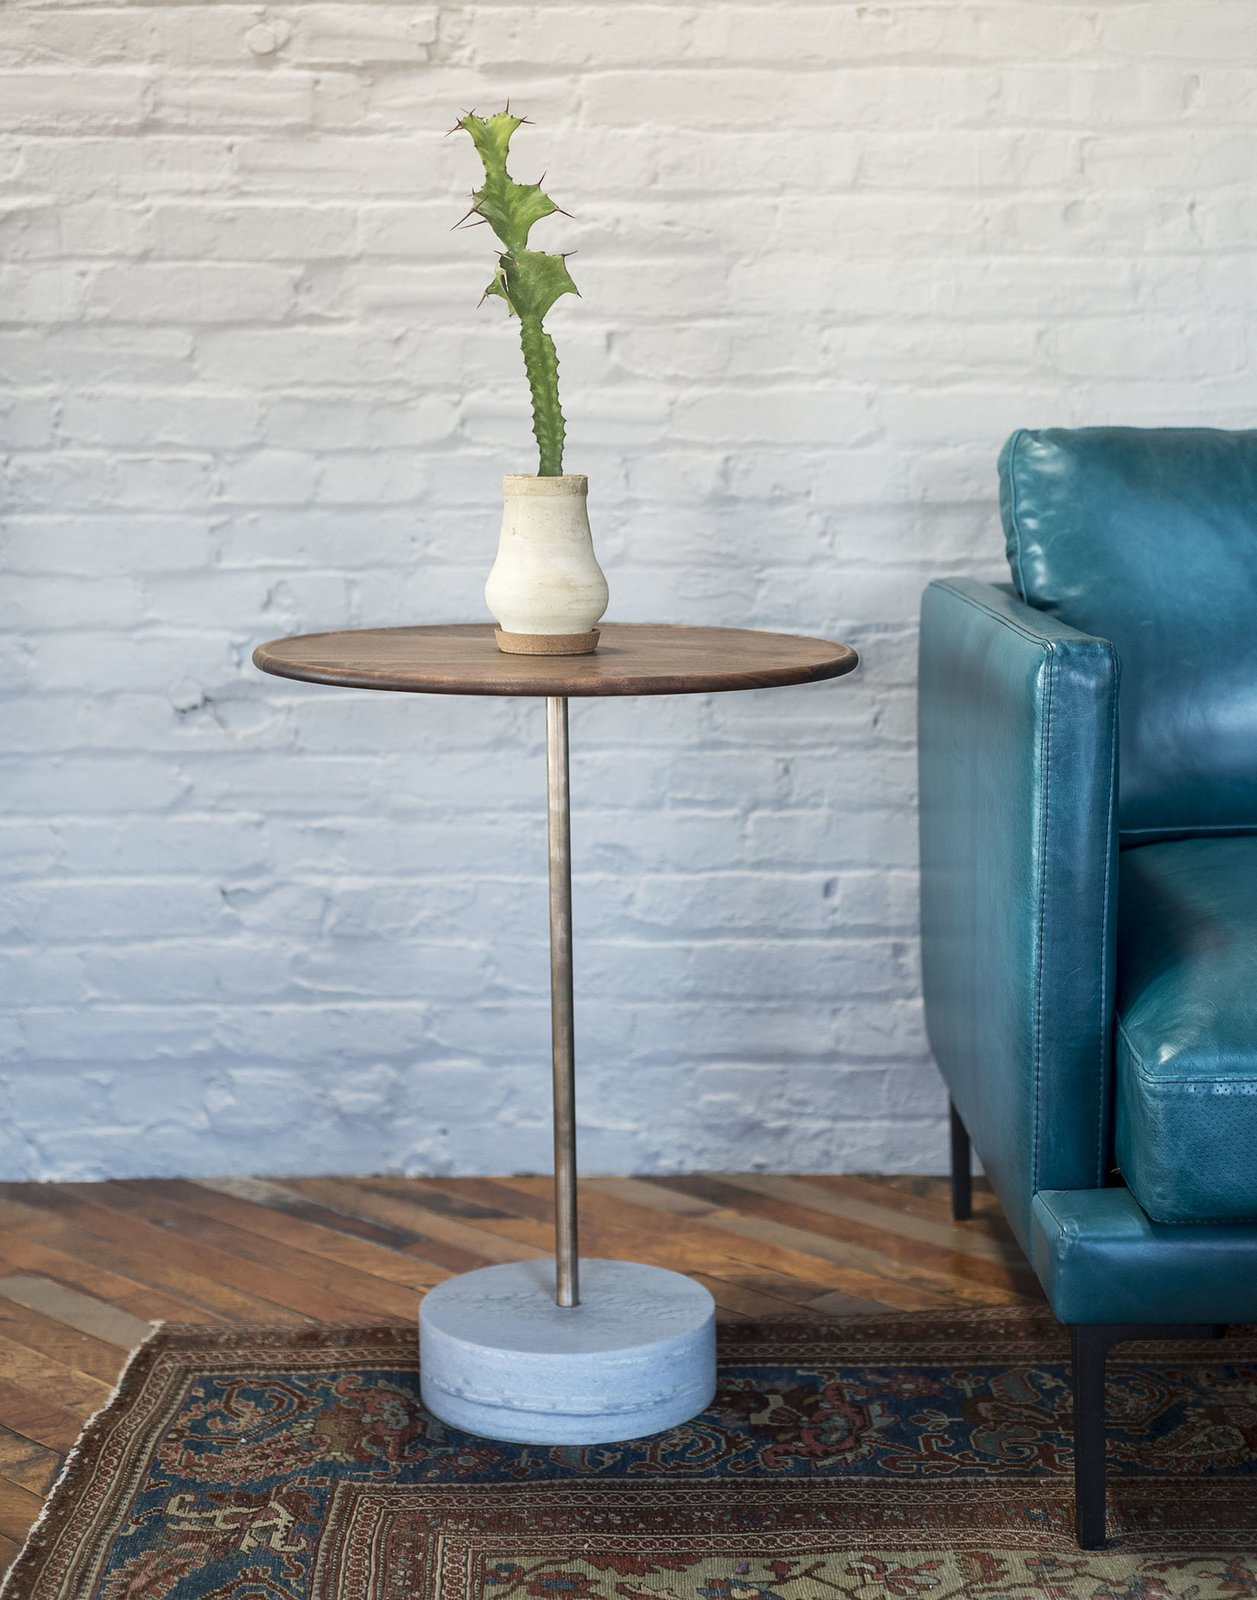 Tagged: Living Room, End Tables, Sofa, and Medium Hardwood Floor.  Mulherin's Hotel by Daniel Olsovsky